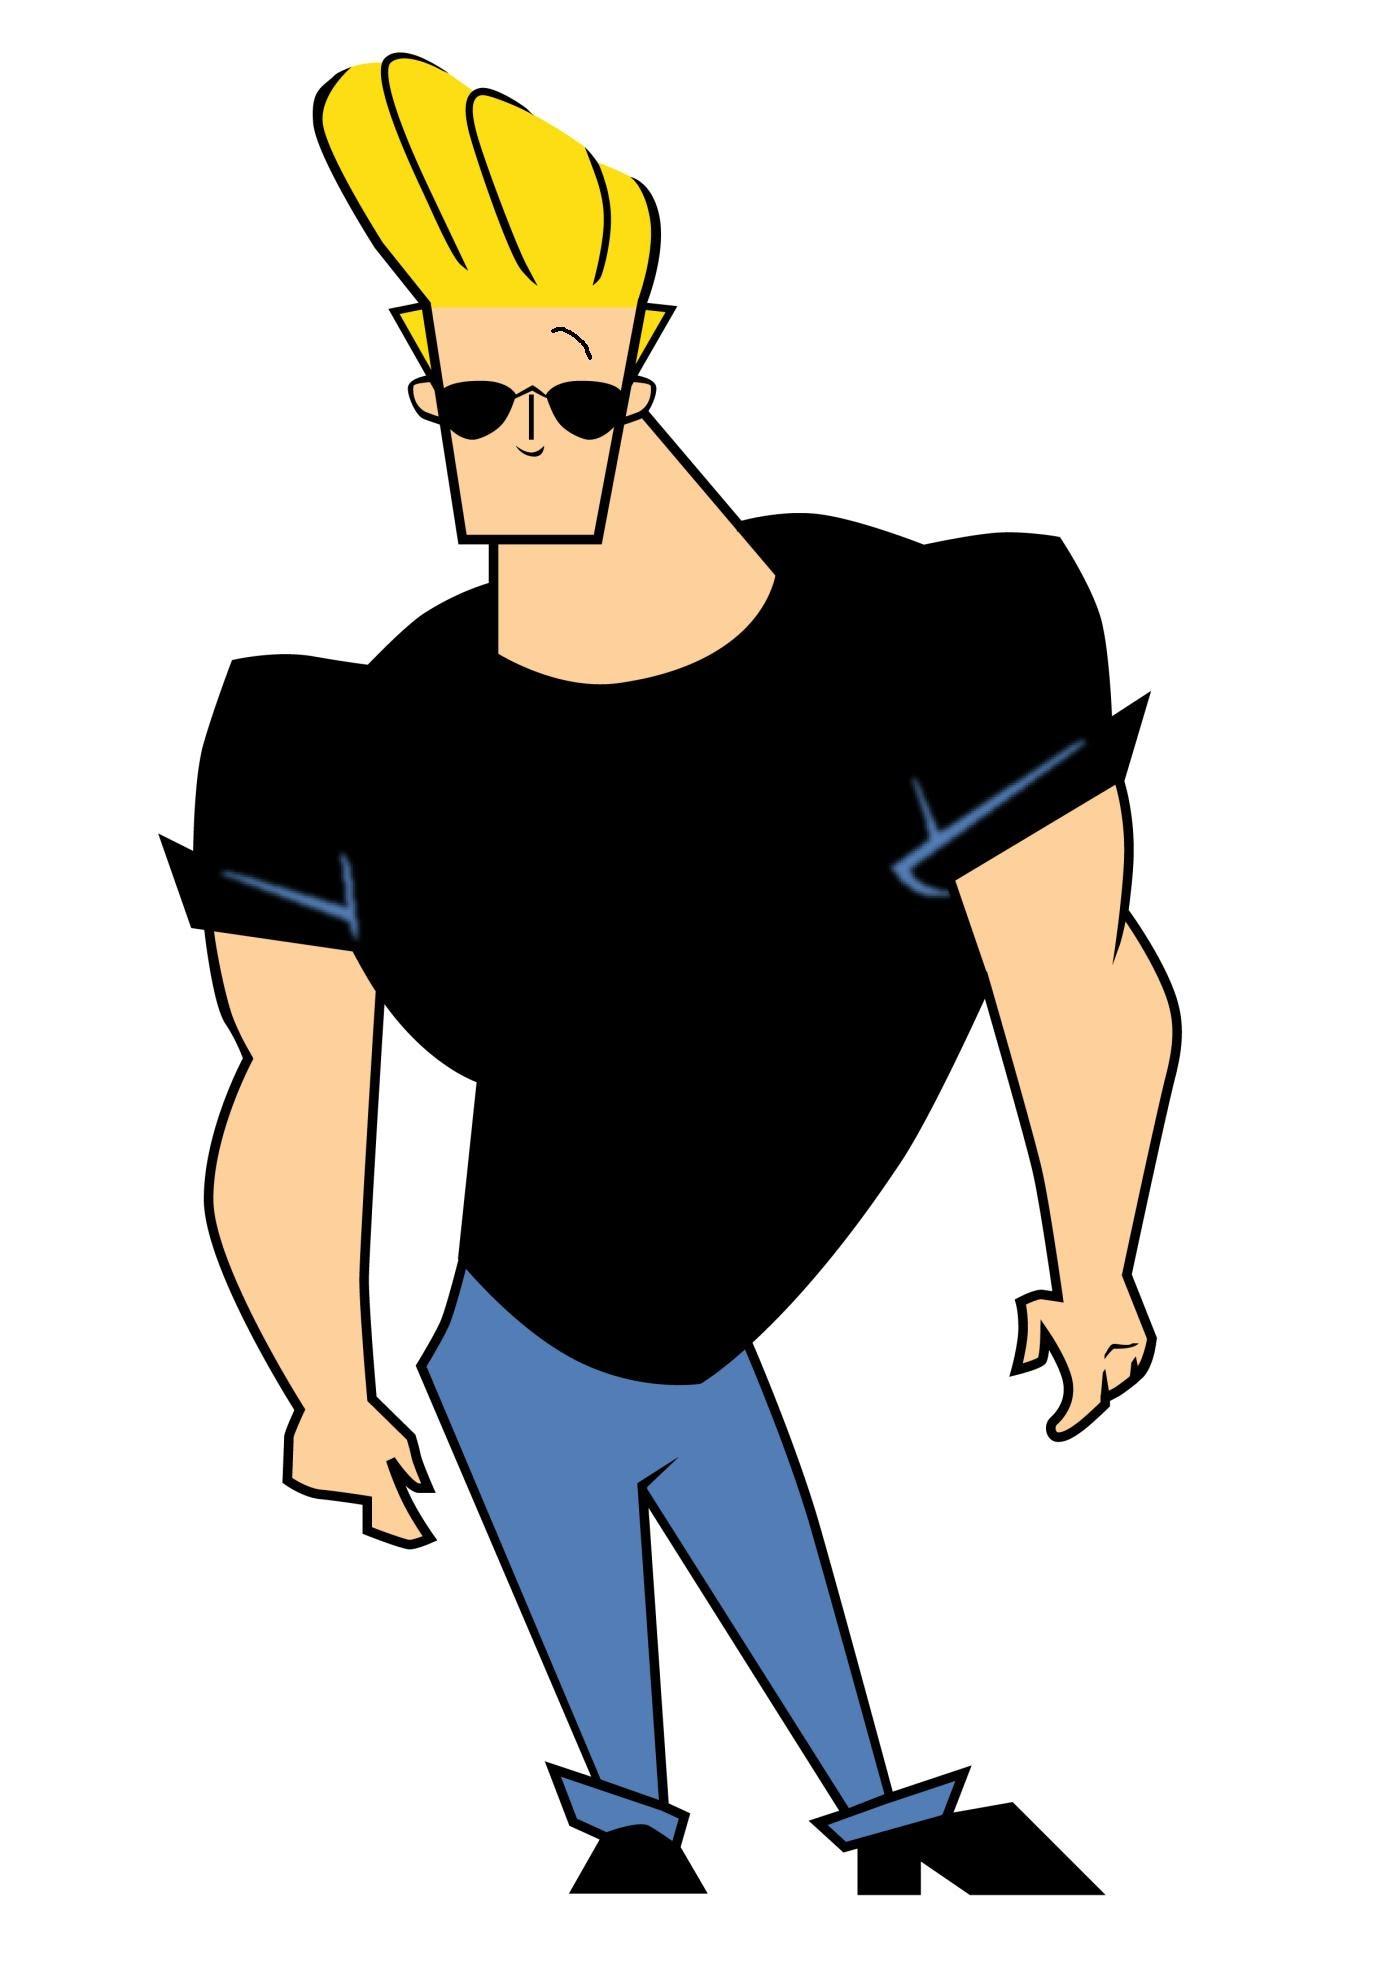 Johnny Bravo (SSBSAGA) | Super Smash Bros. Fanon | FANDOM powered by ...